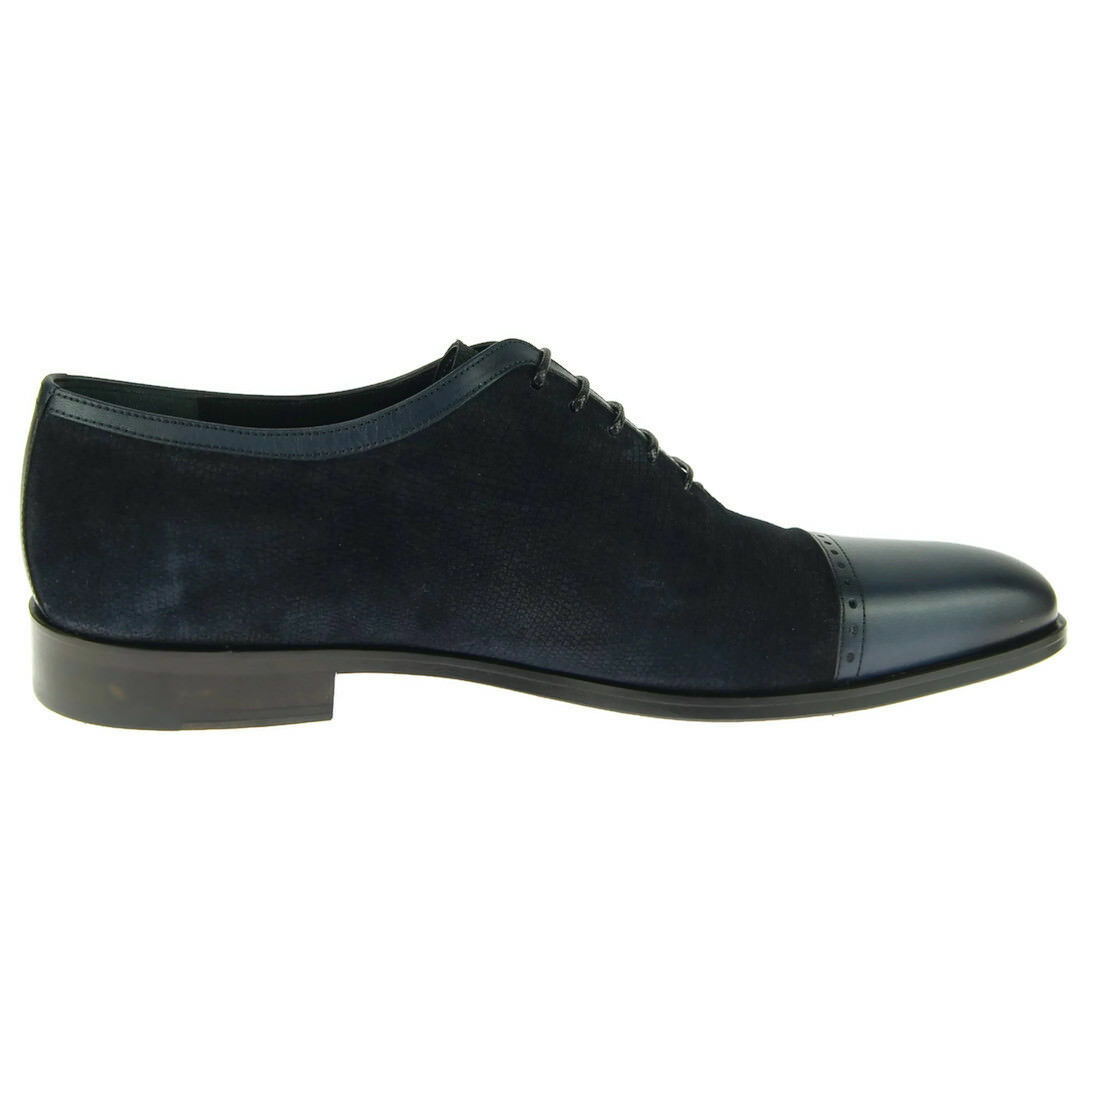 Corrente Corrente Corrente 4560 Cap Toe Oxford, Suede Leather Men's Dress shoes, bluee 4e9735